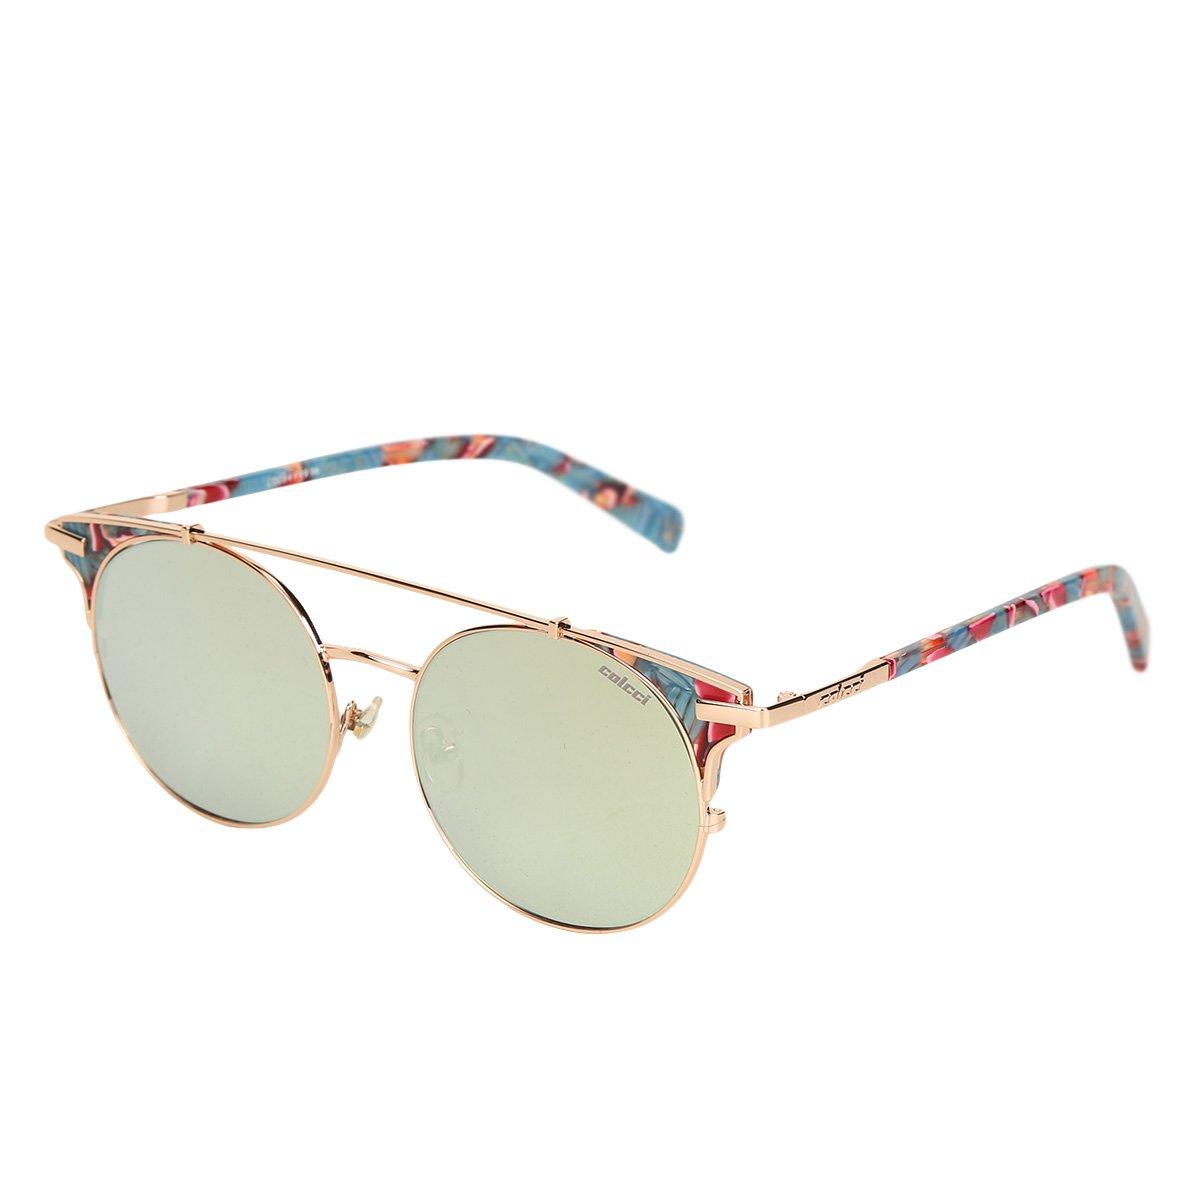 fda37dd7c Óculos de Sol Colcci Gatinho Brilho Feminino